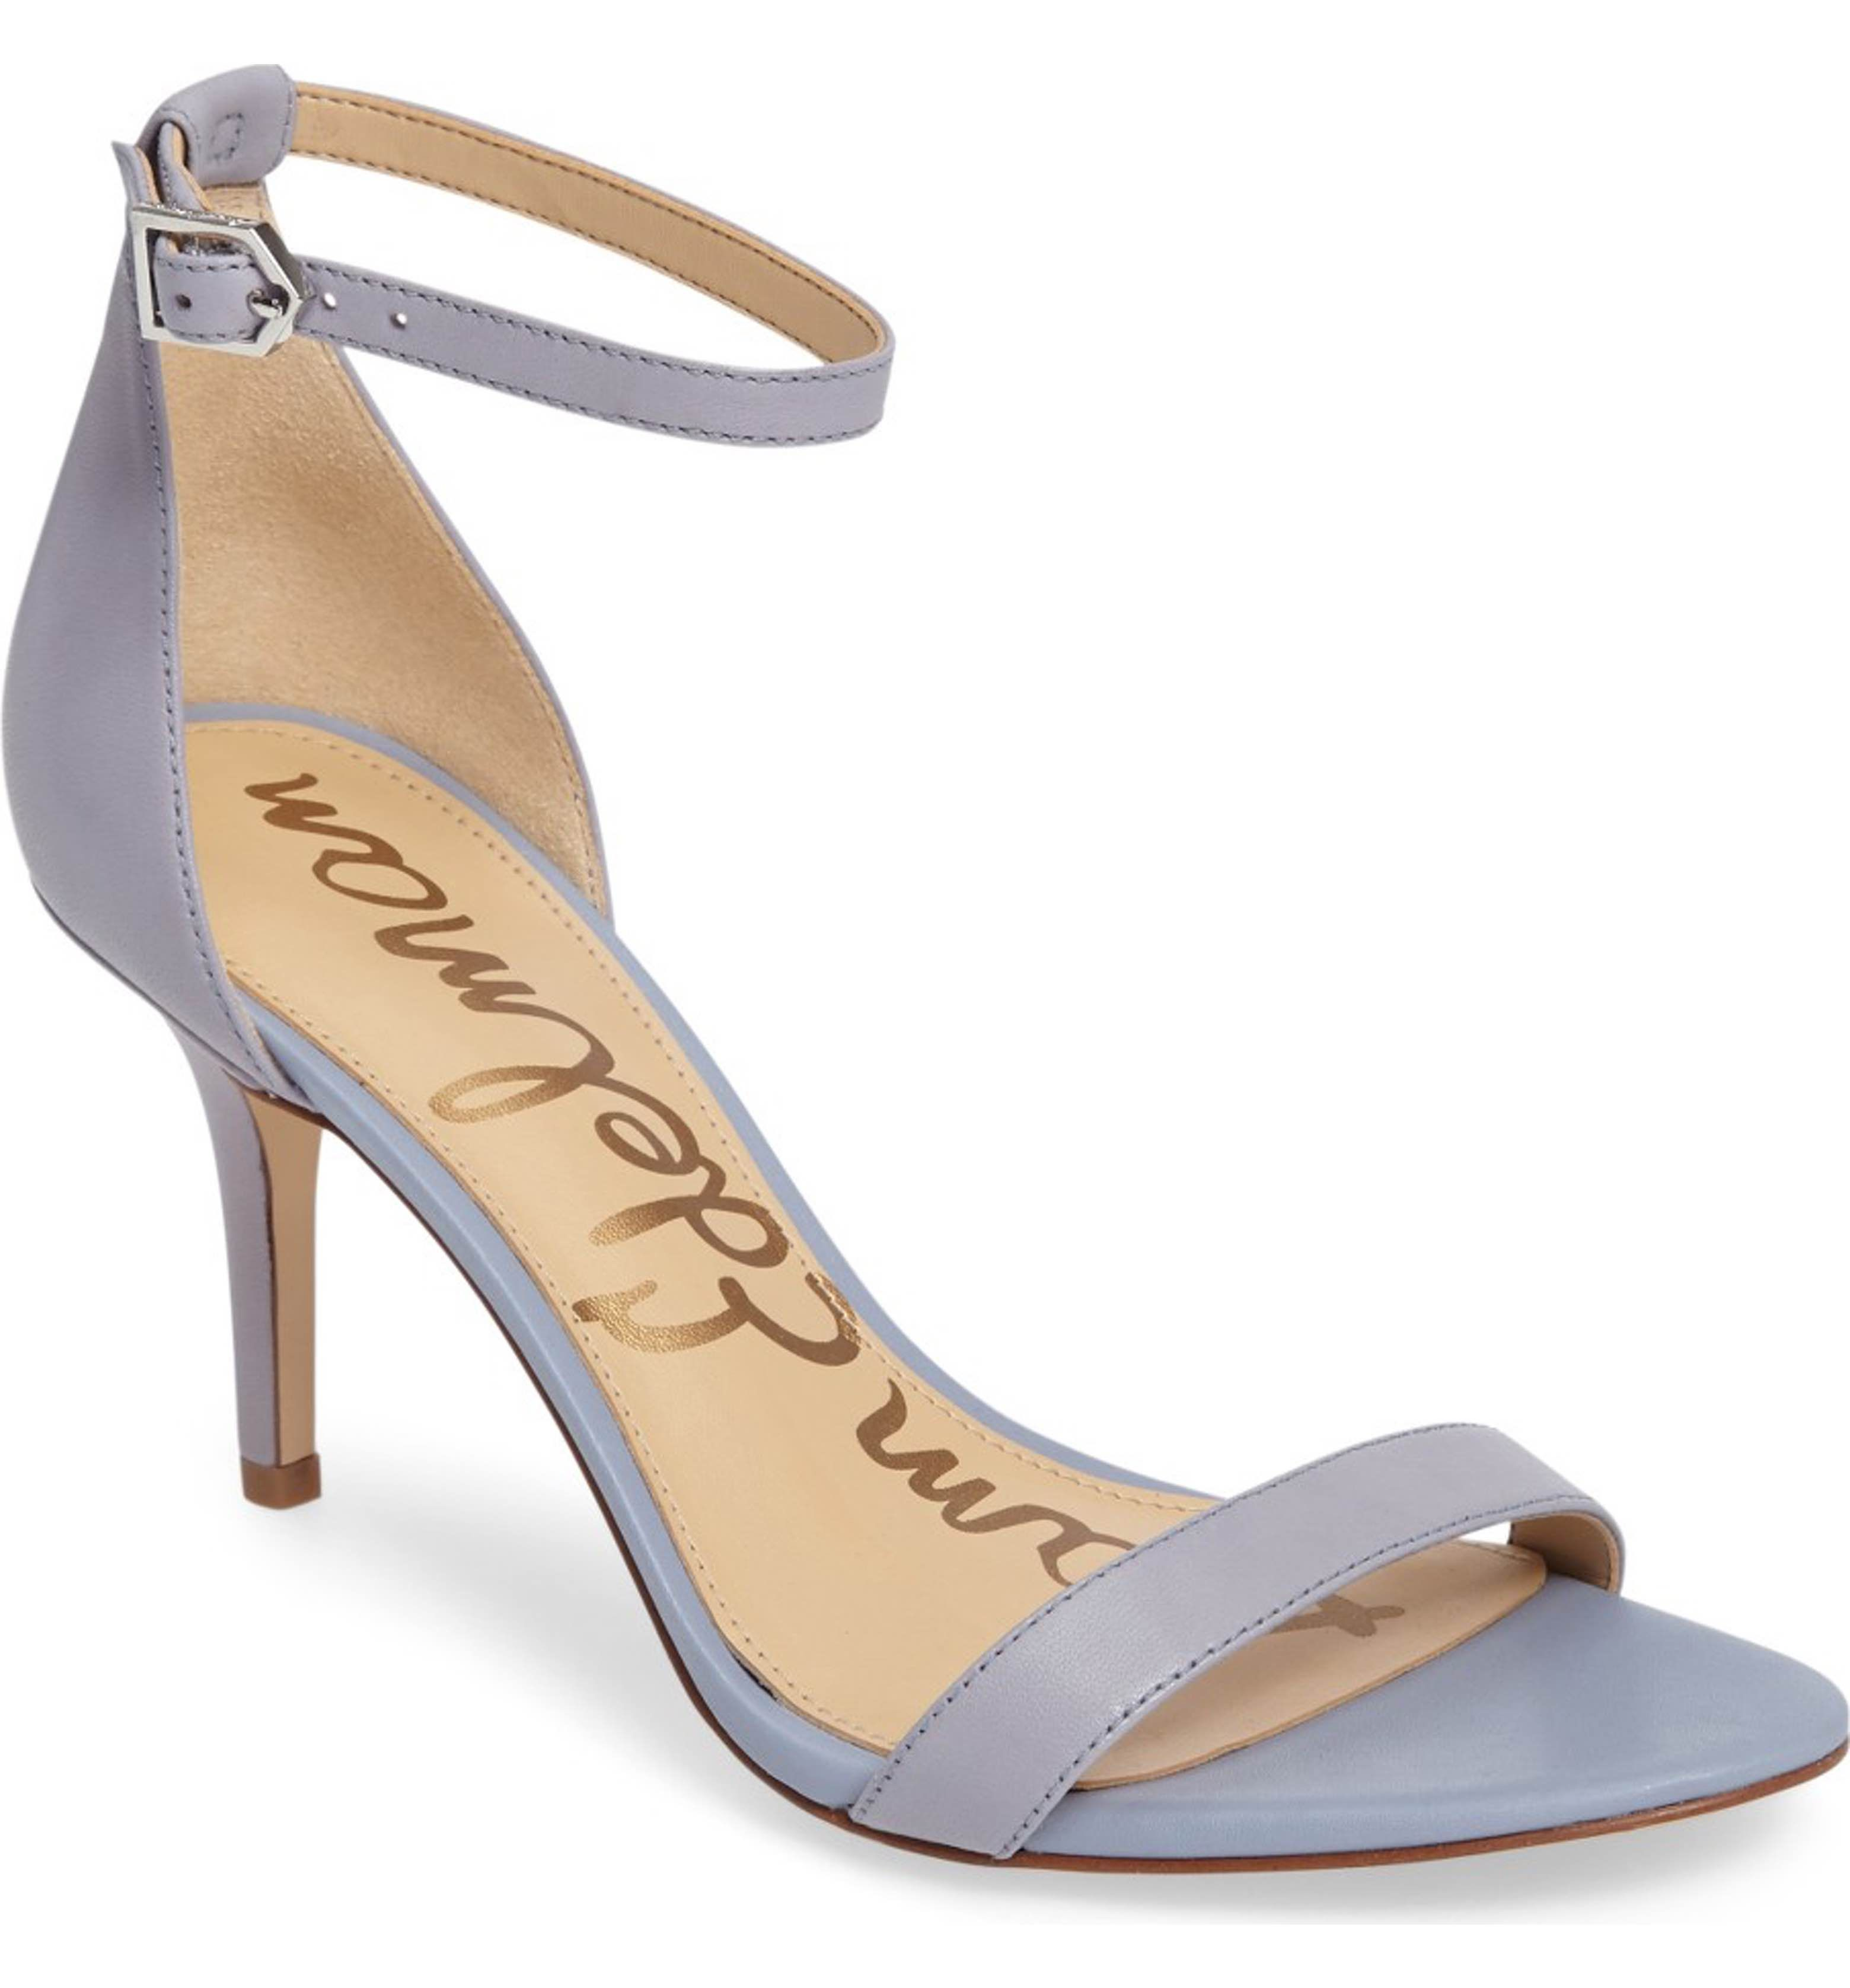 Bridal Shoes At Nordstrom: Sam Edelman Patti Strappy Sandal (Women